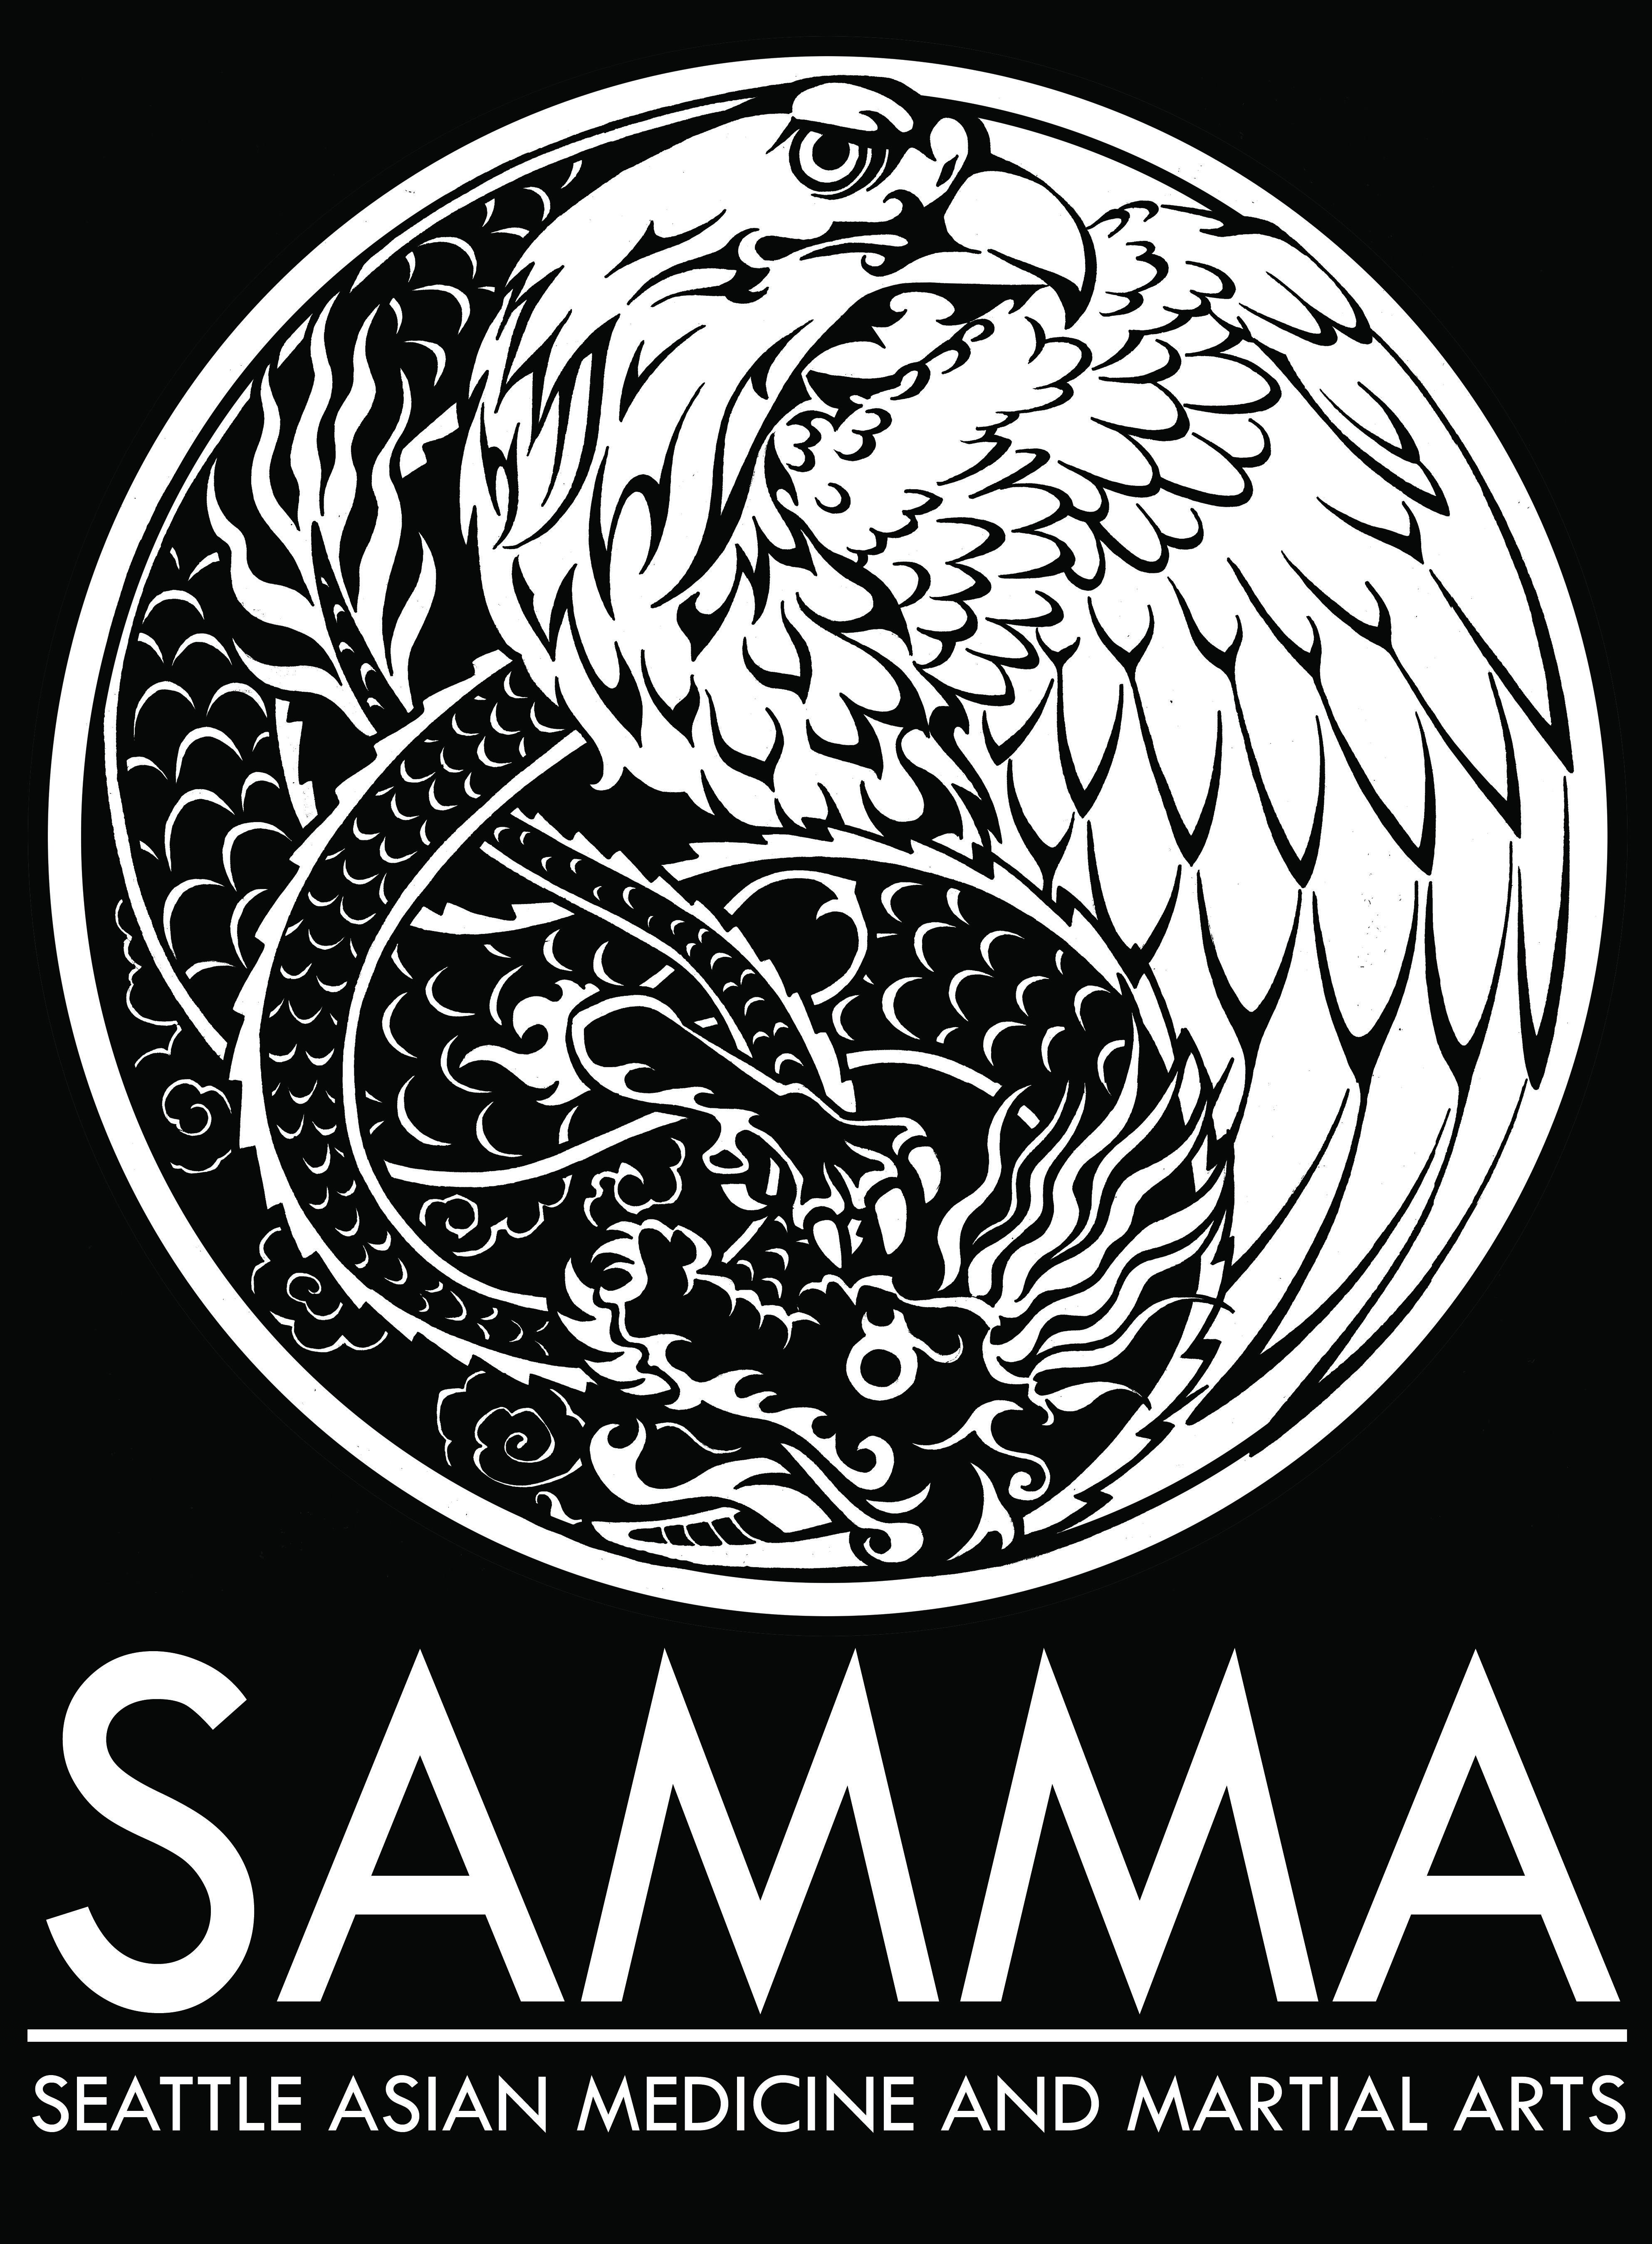 SAMMA logo with text, black background.